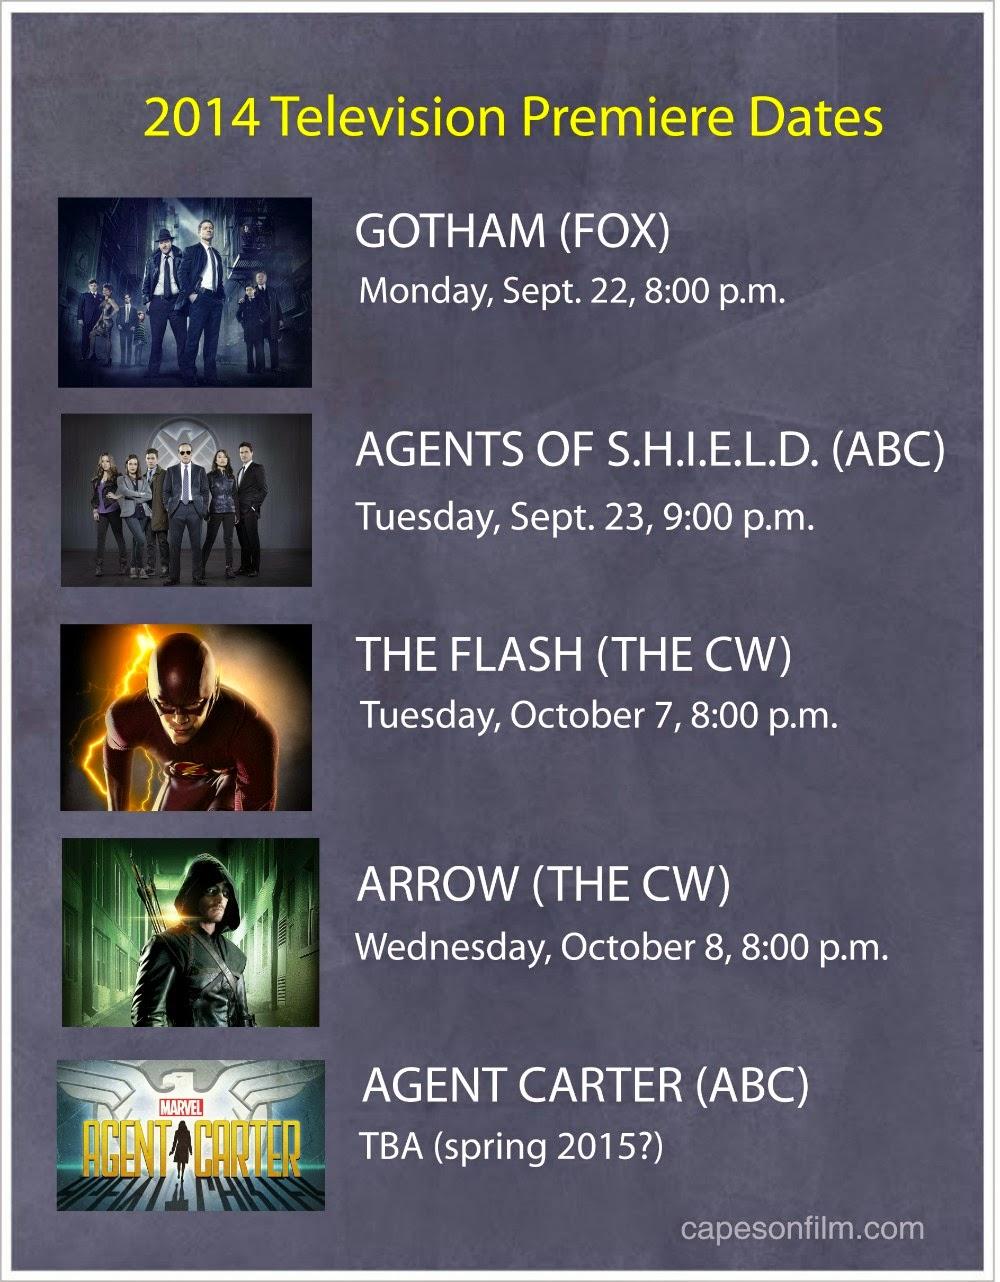 2014 TV premiere dates